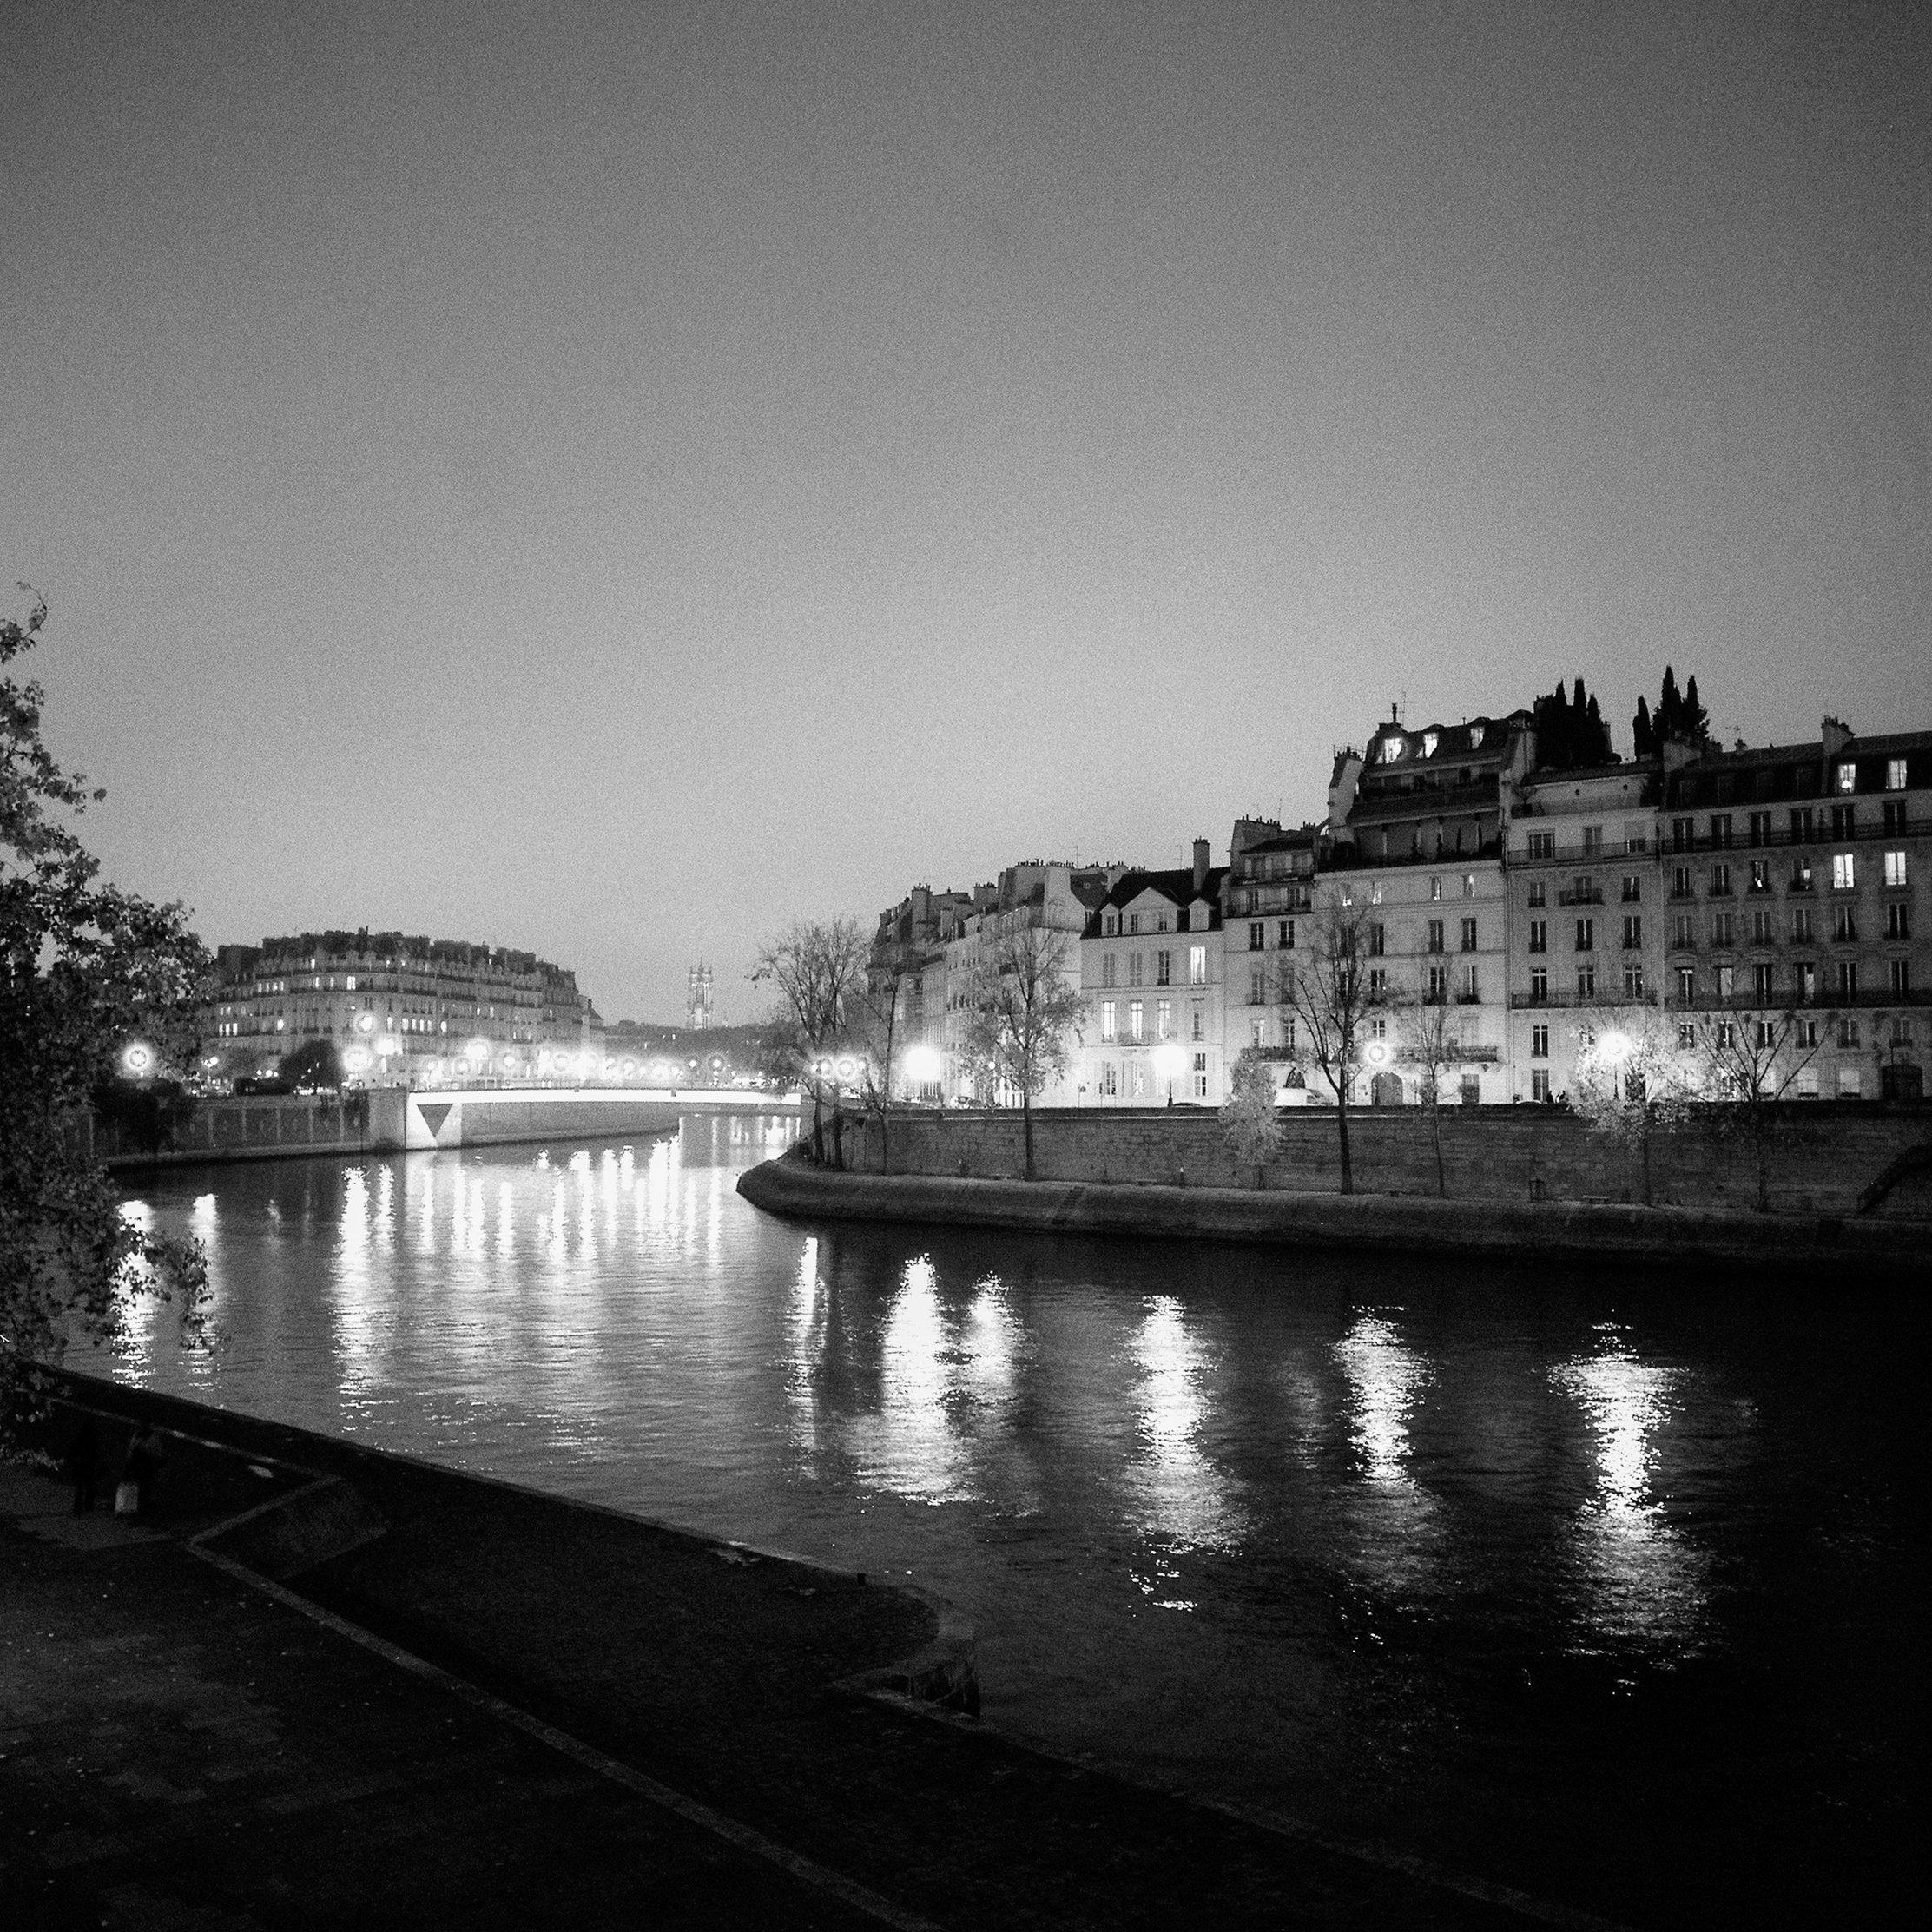 Paris-at-night-best-photo-locations.jpg